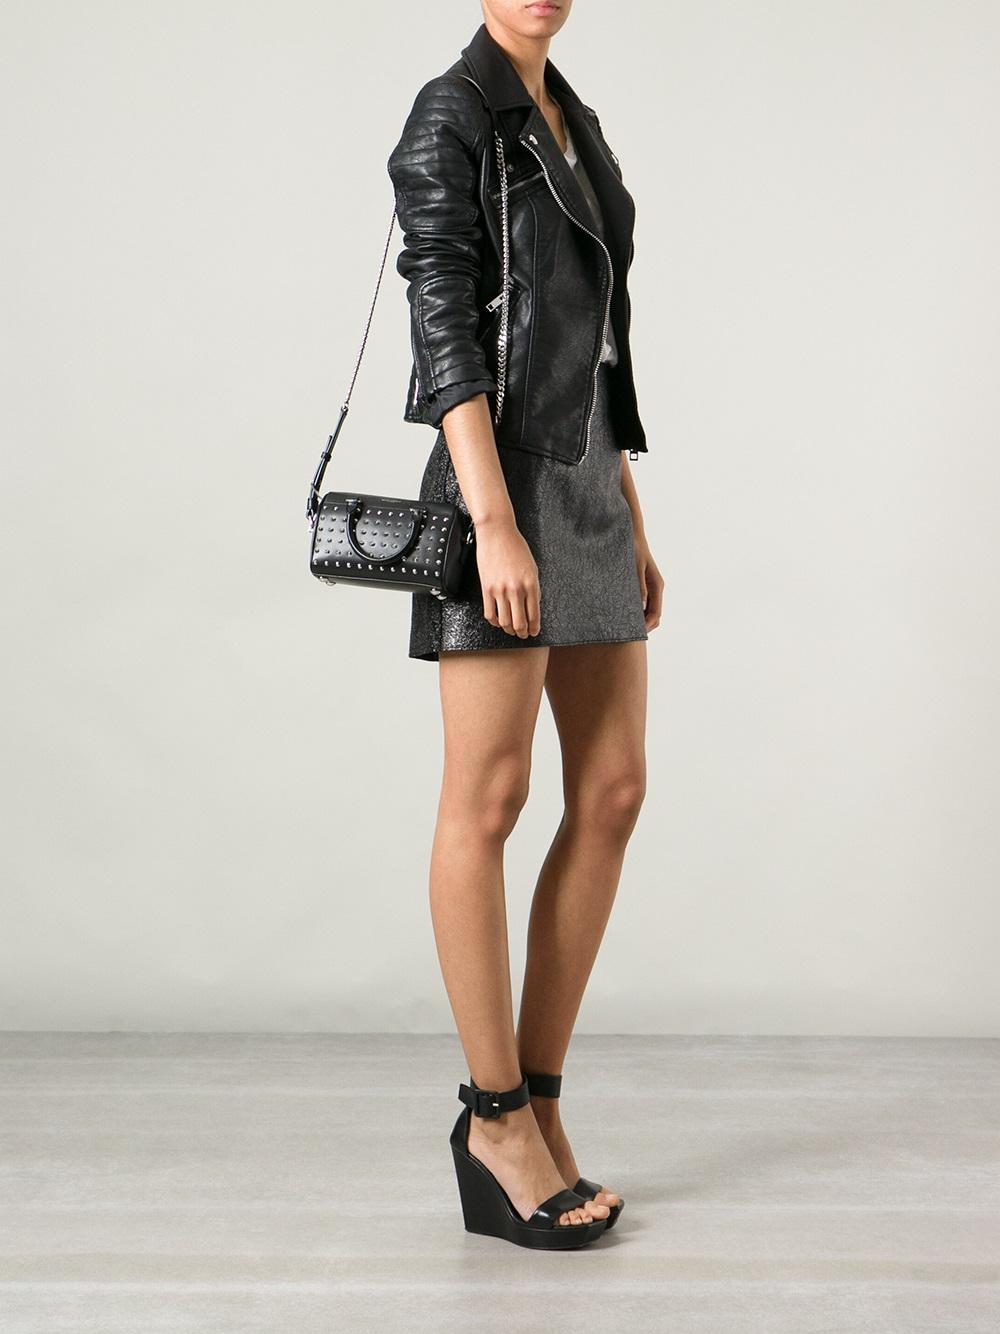 3af3efc3d94 Saint Laurent Toy Classic Duffle Shoulder Bag in Black - Lyst